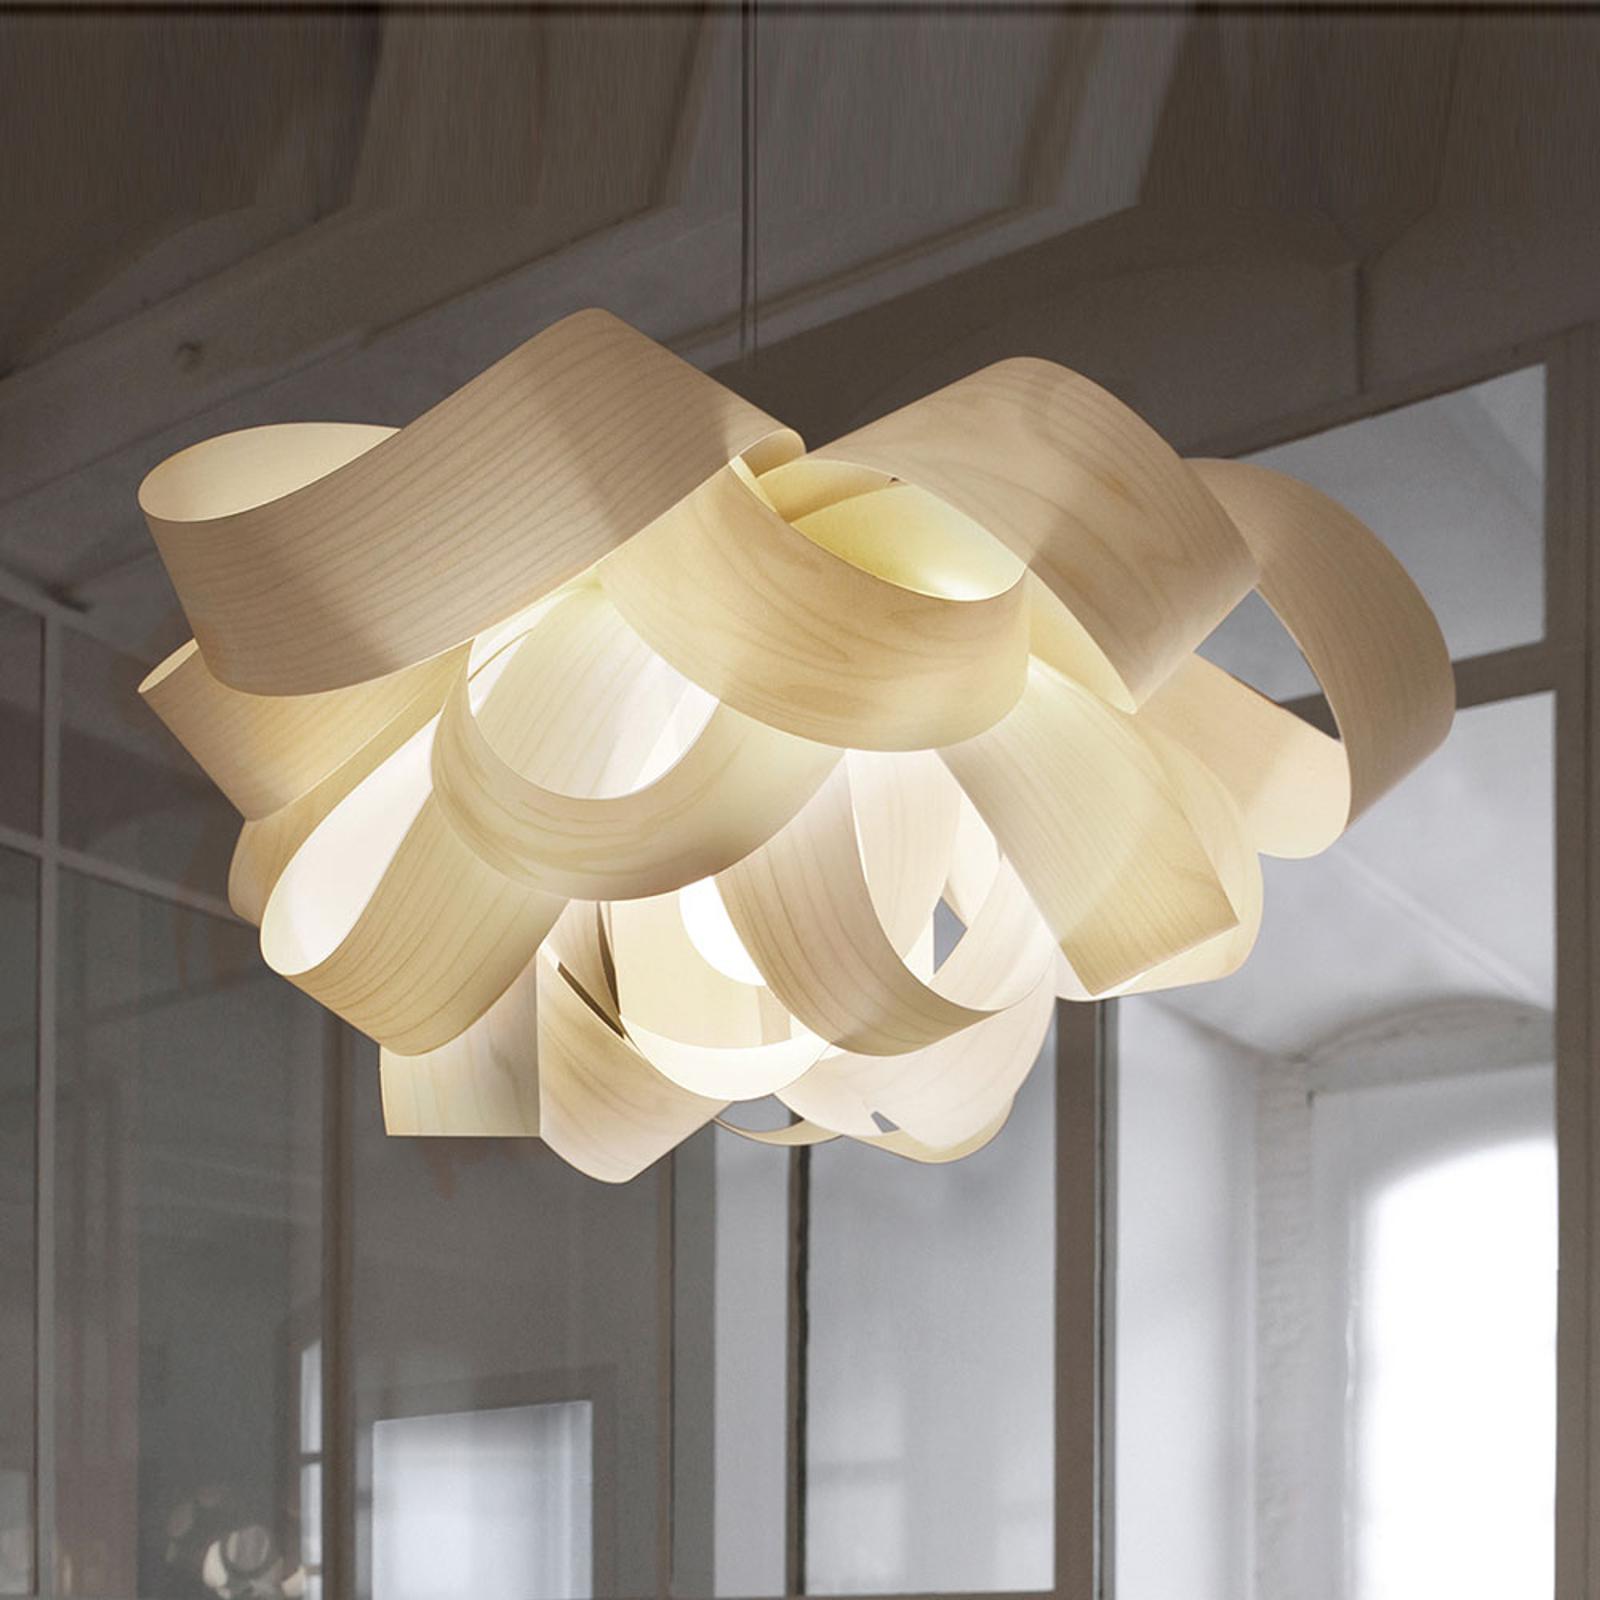 LZF Agatha Small lampa wisząca, 78x76cm, kość